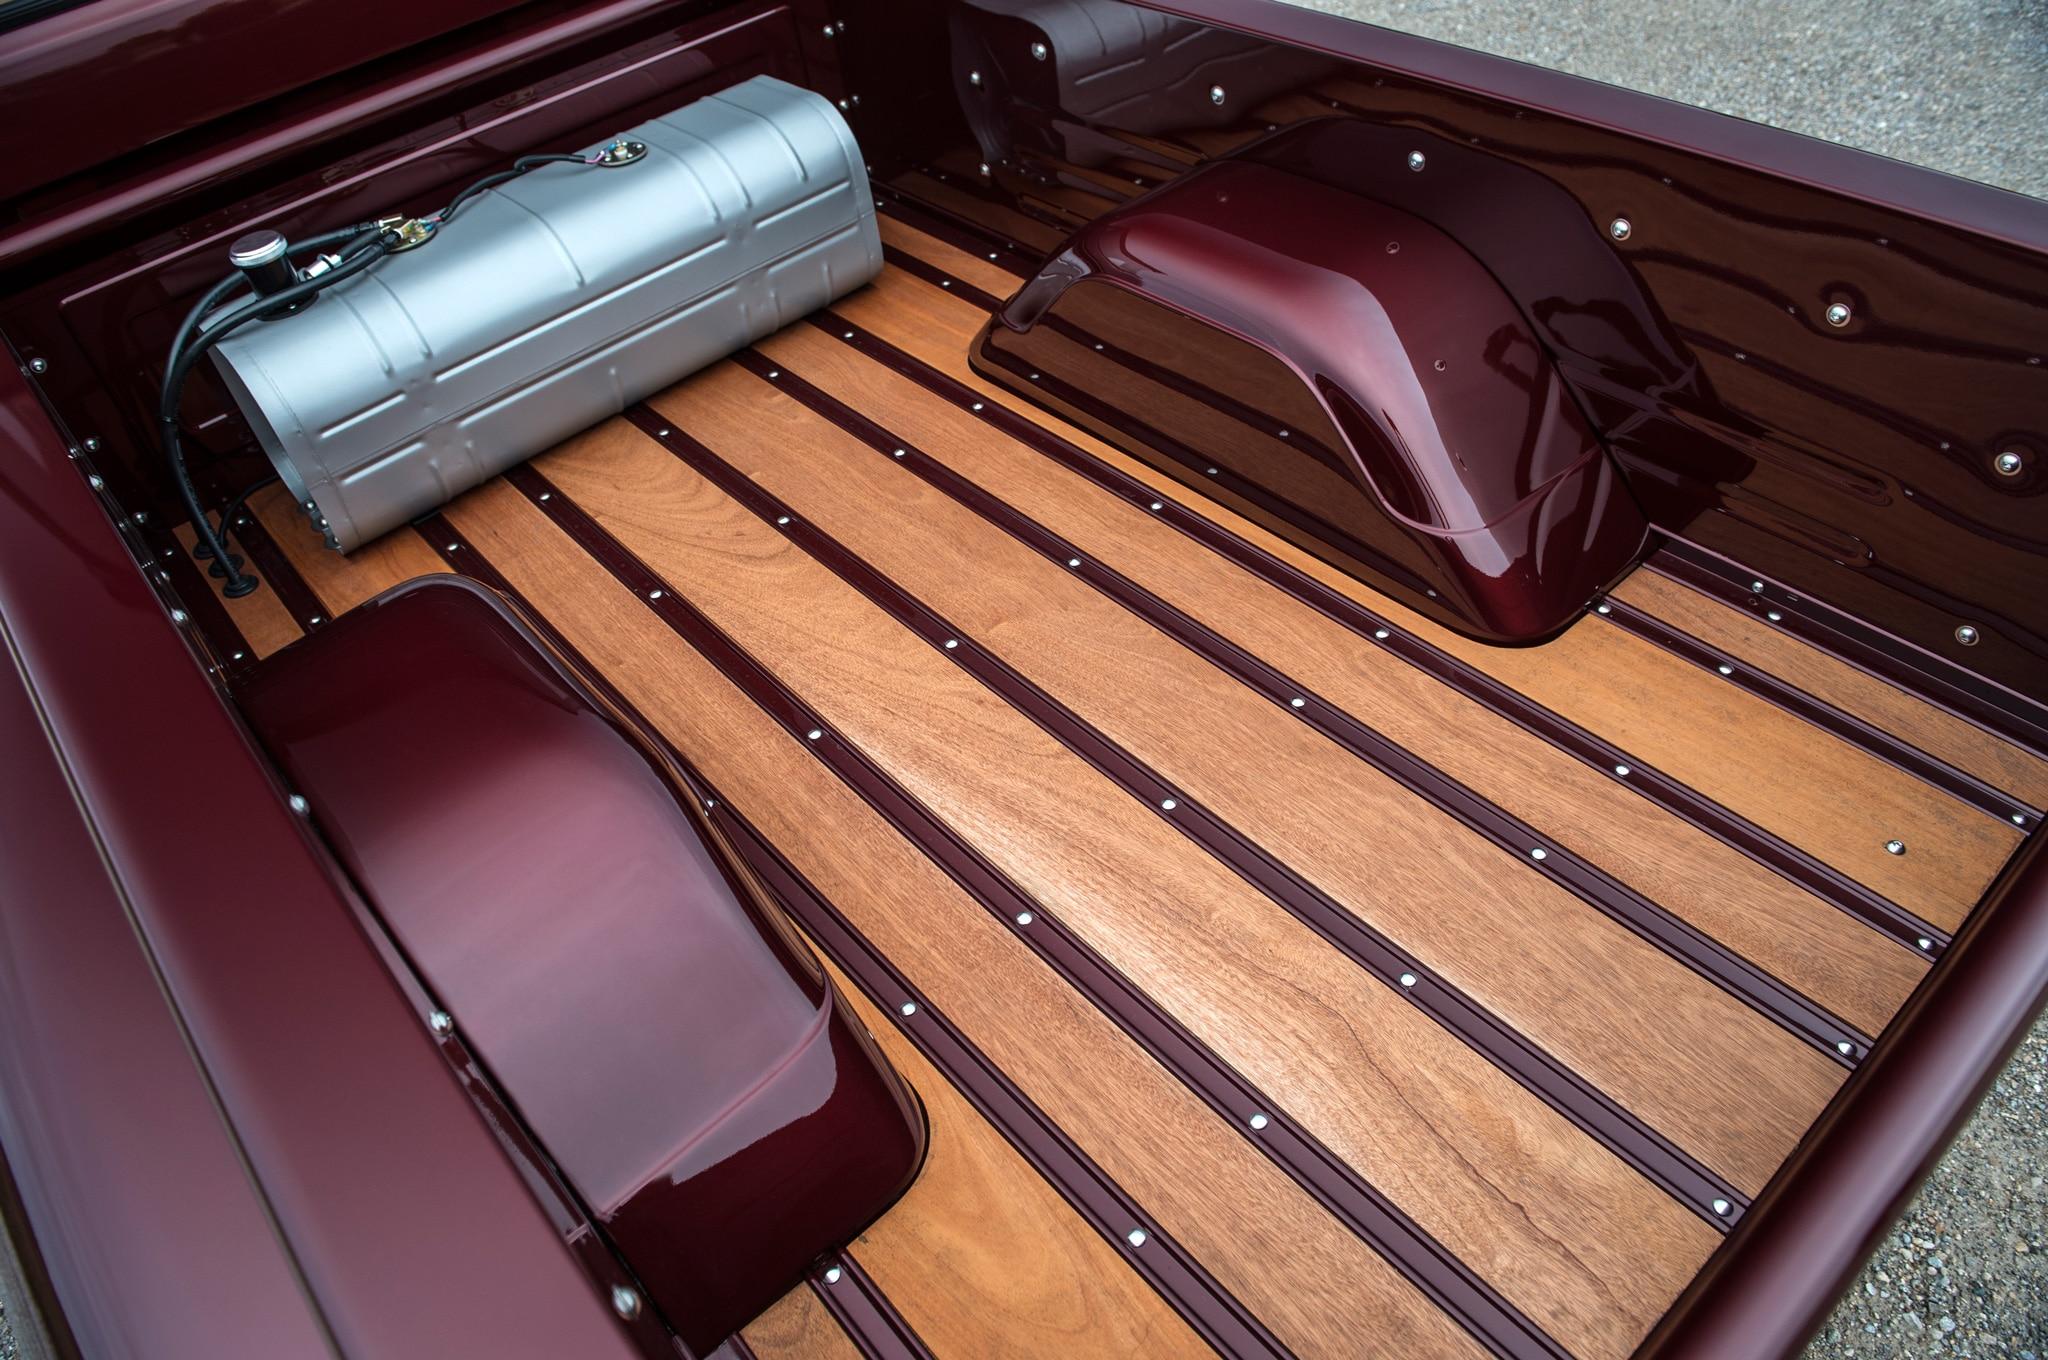 1957 chevrolet task force napco legacy classic trucks sapele wood bed floor